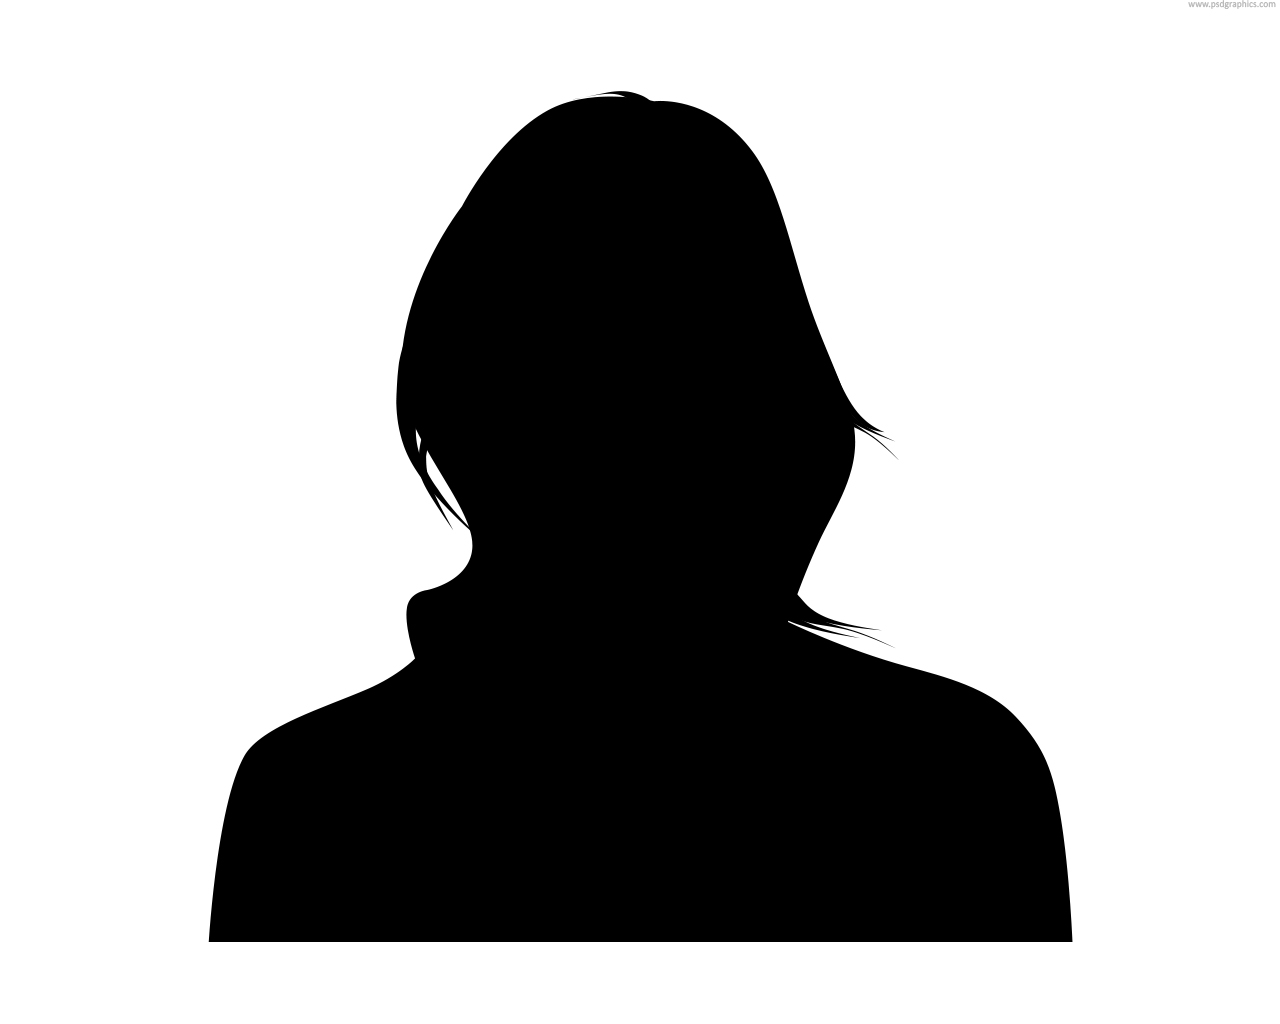 face-head-woman-female-icon-28